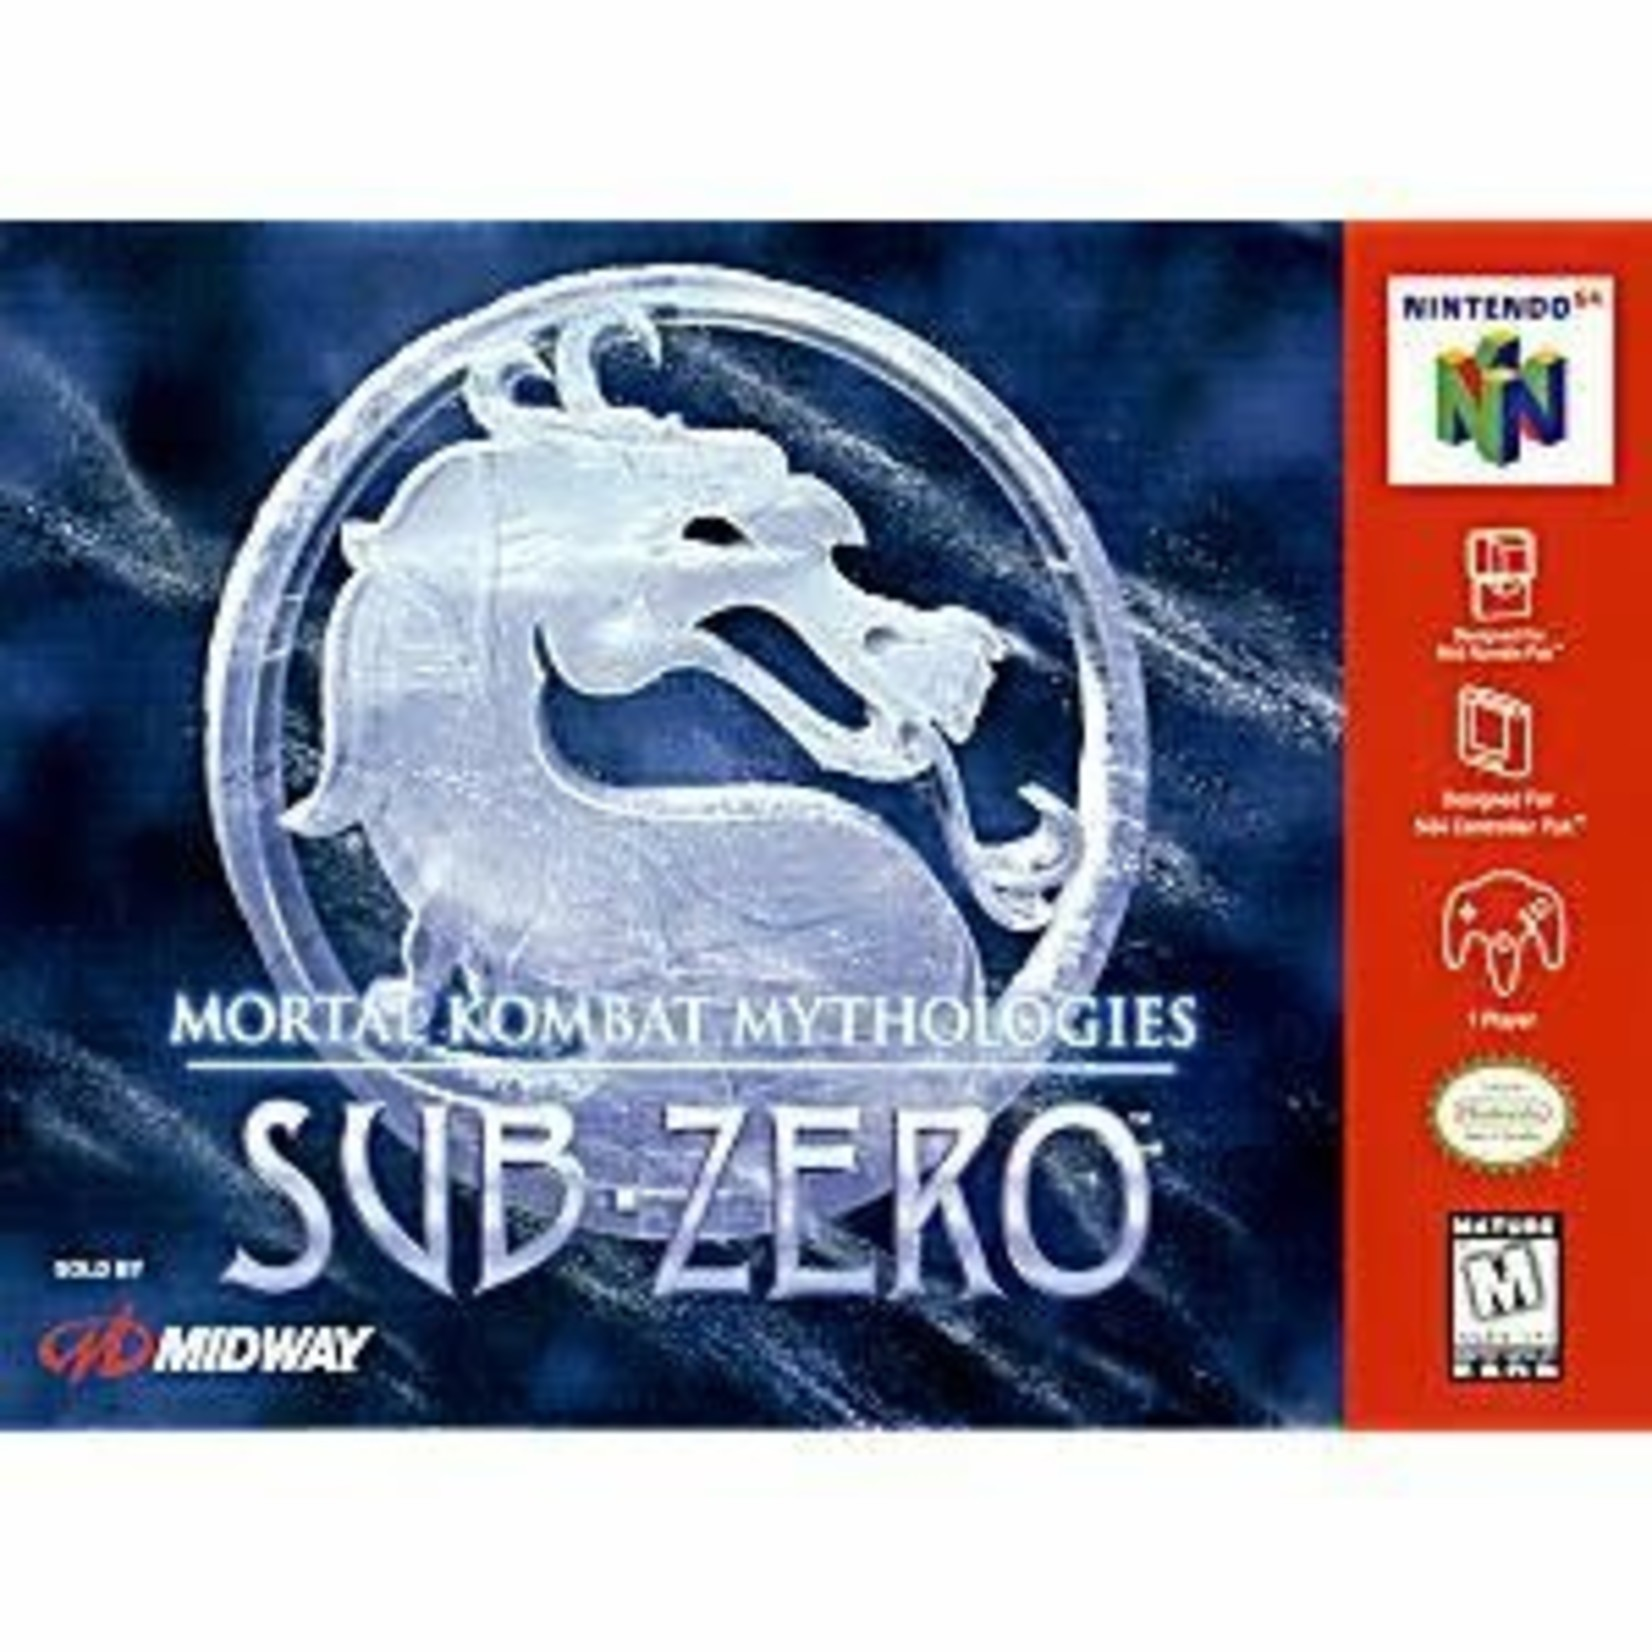 N64U-Mortal Kombat Mythologies: Sub-Zero (cartridge)